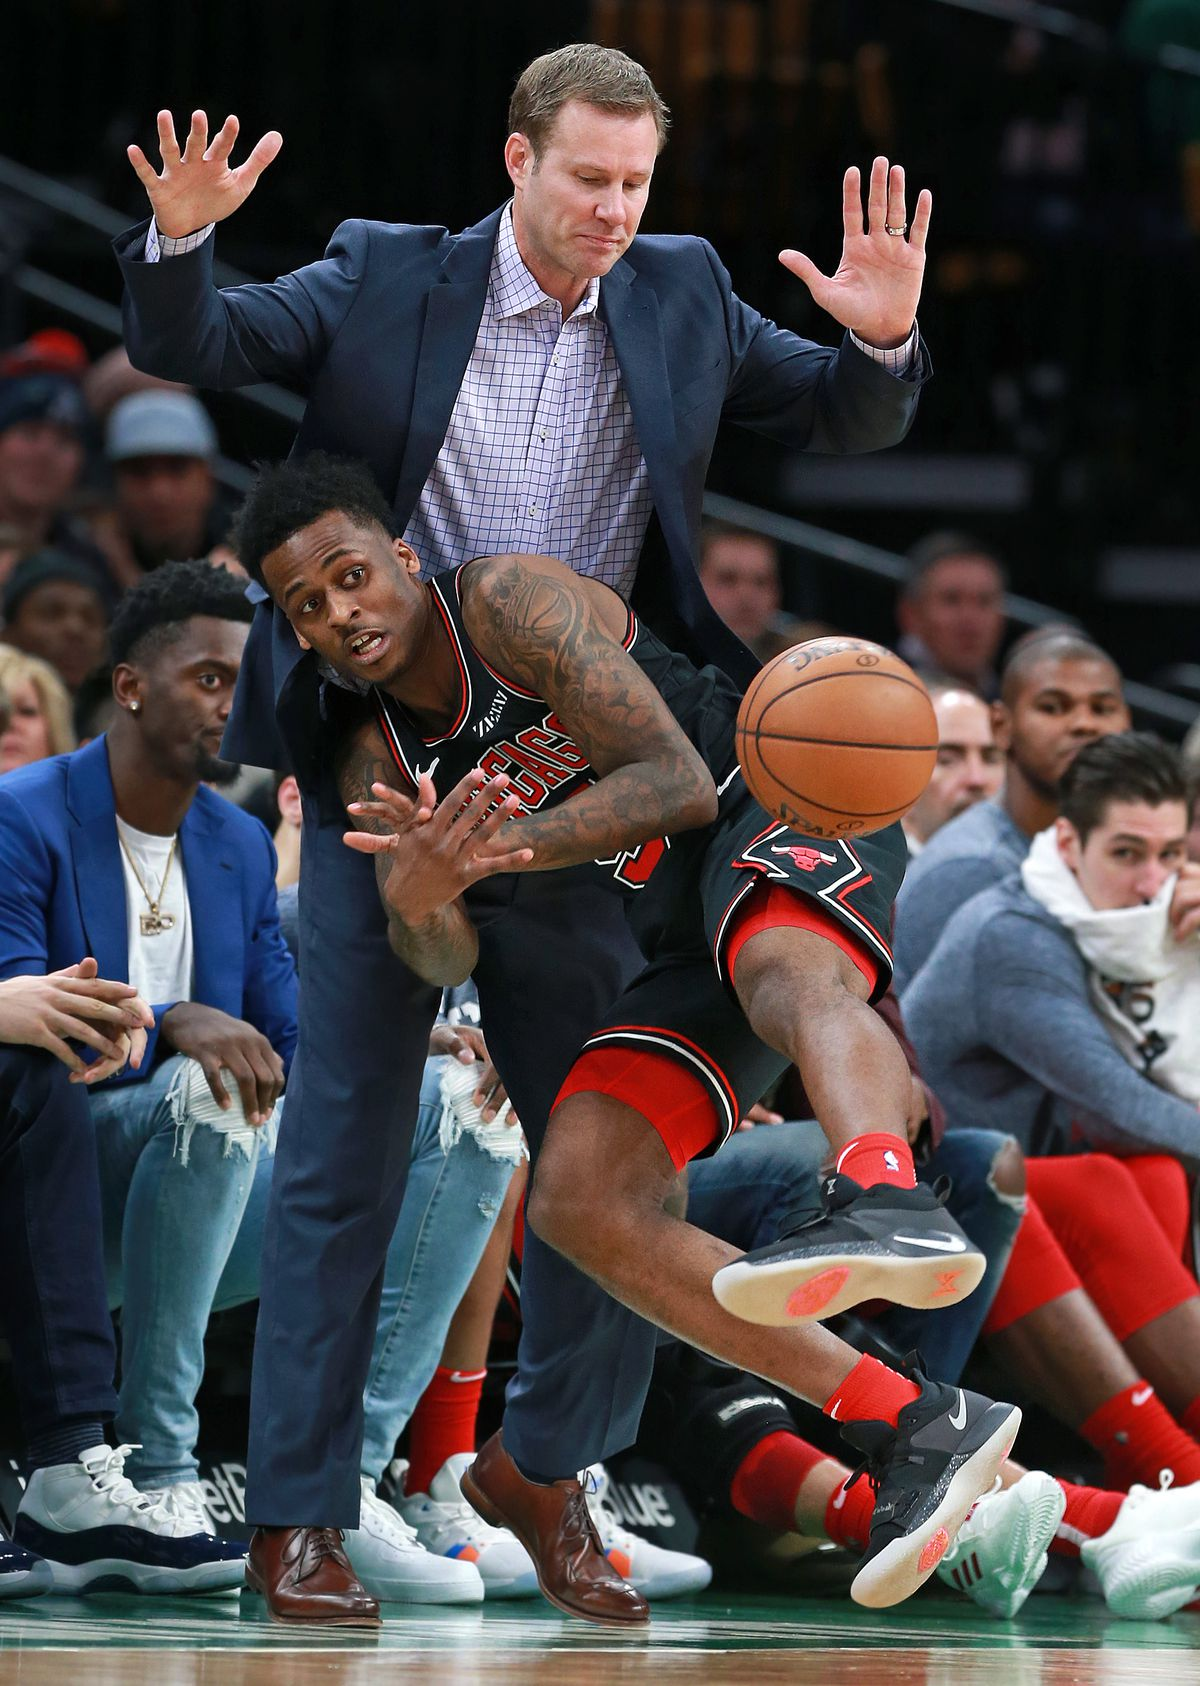 Chicago Bulls Vs Boston Celtics At TD Garden